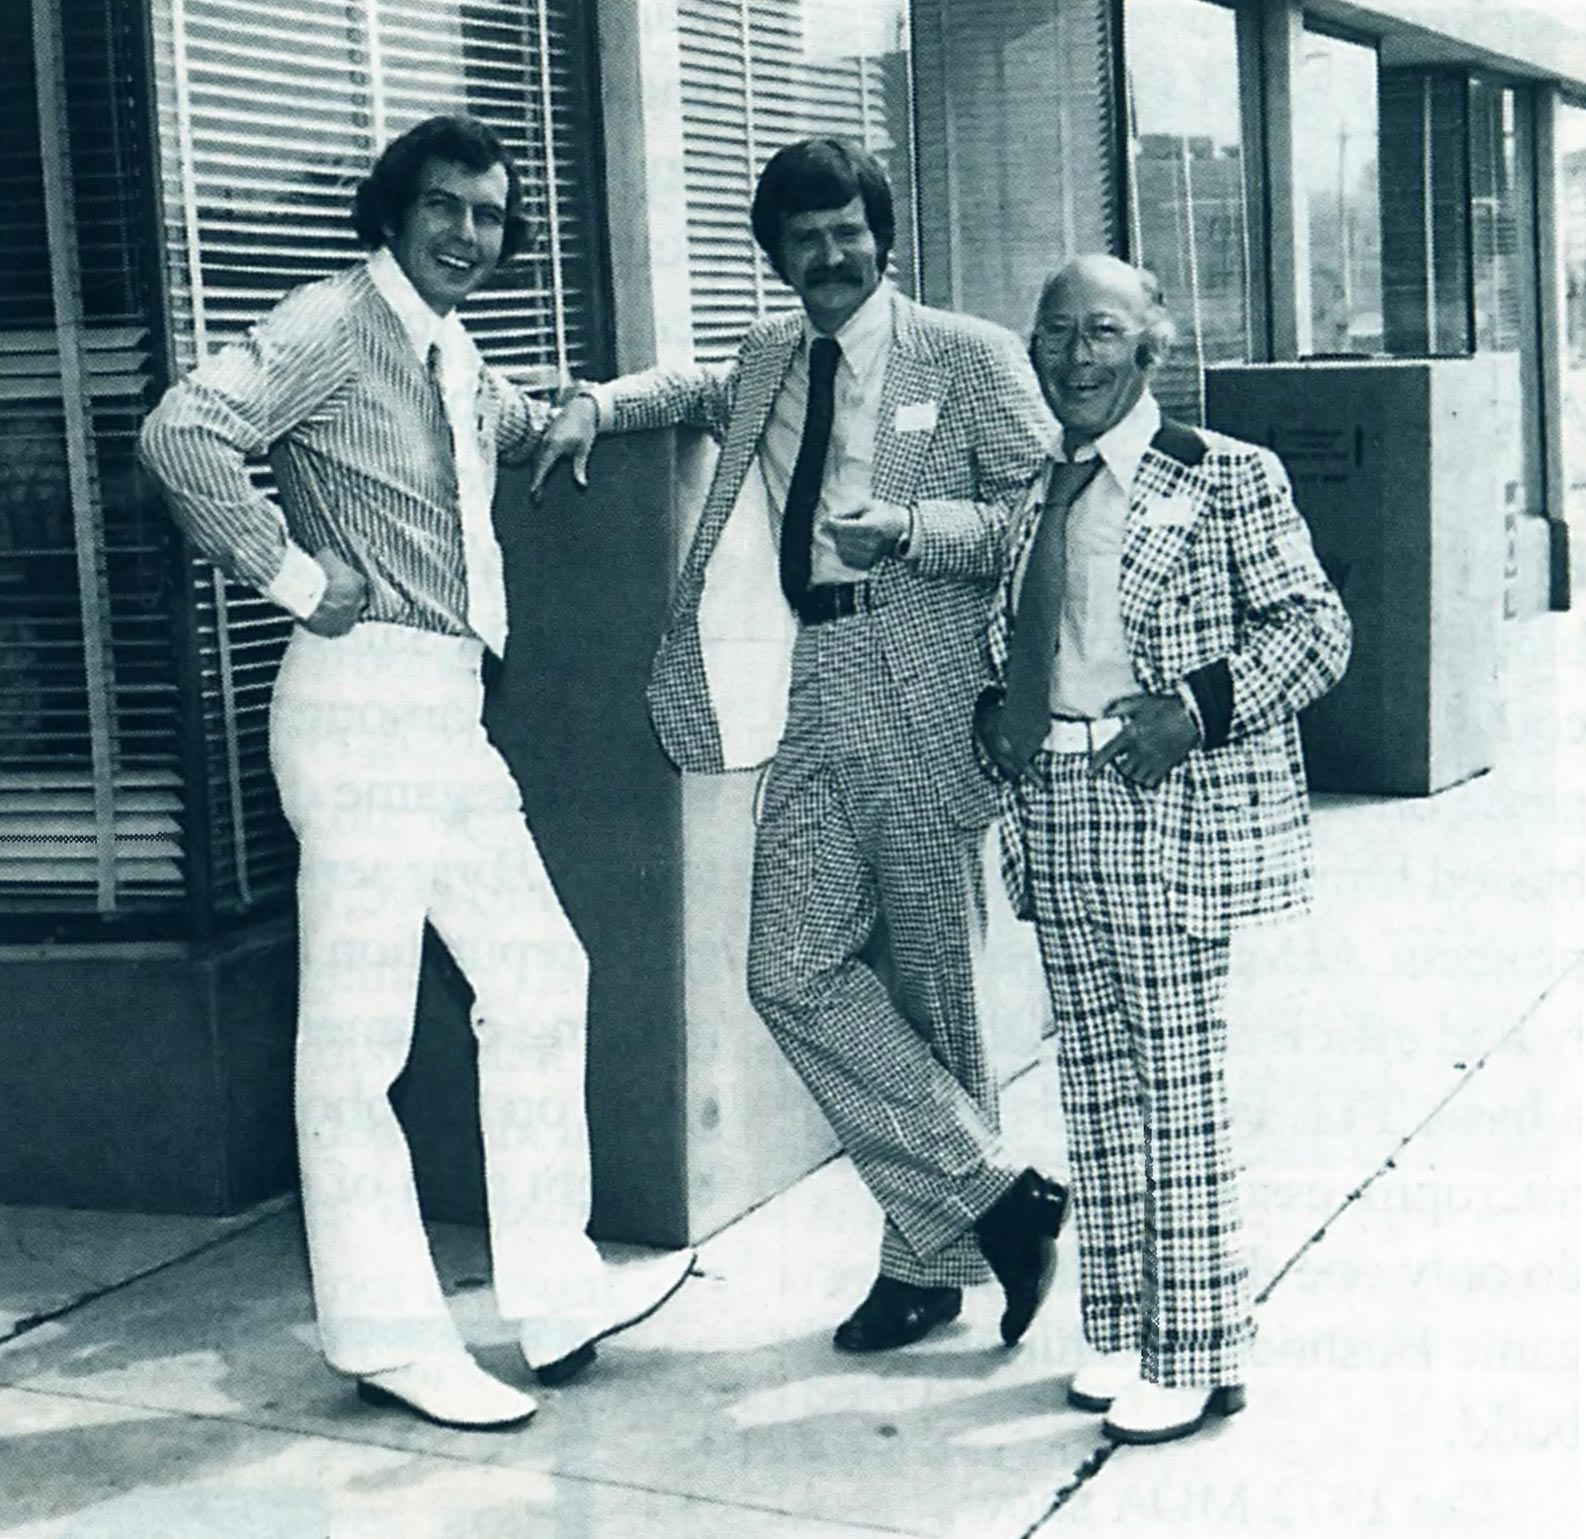 L.-R., Atari execs Nolan Bushnell and Pat Karns, with game distributor Al Bettelman, 1974